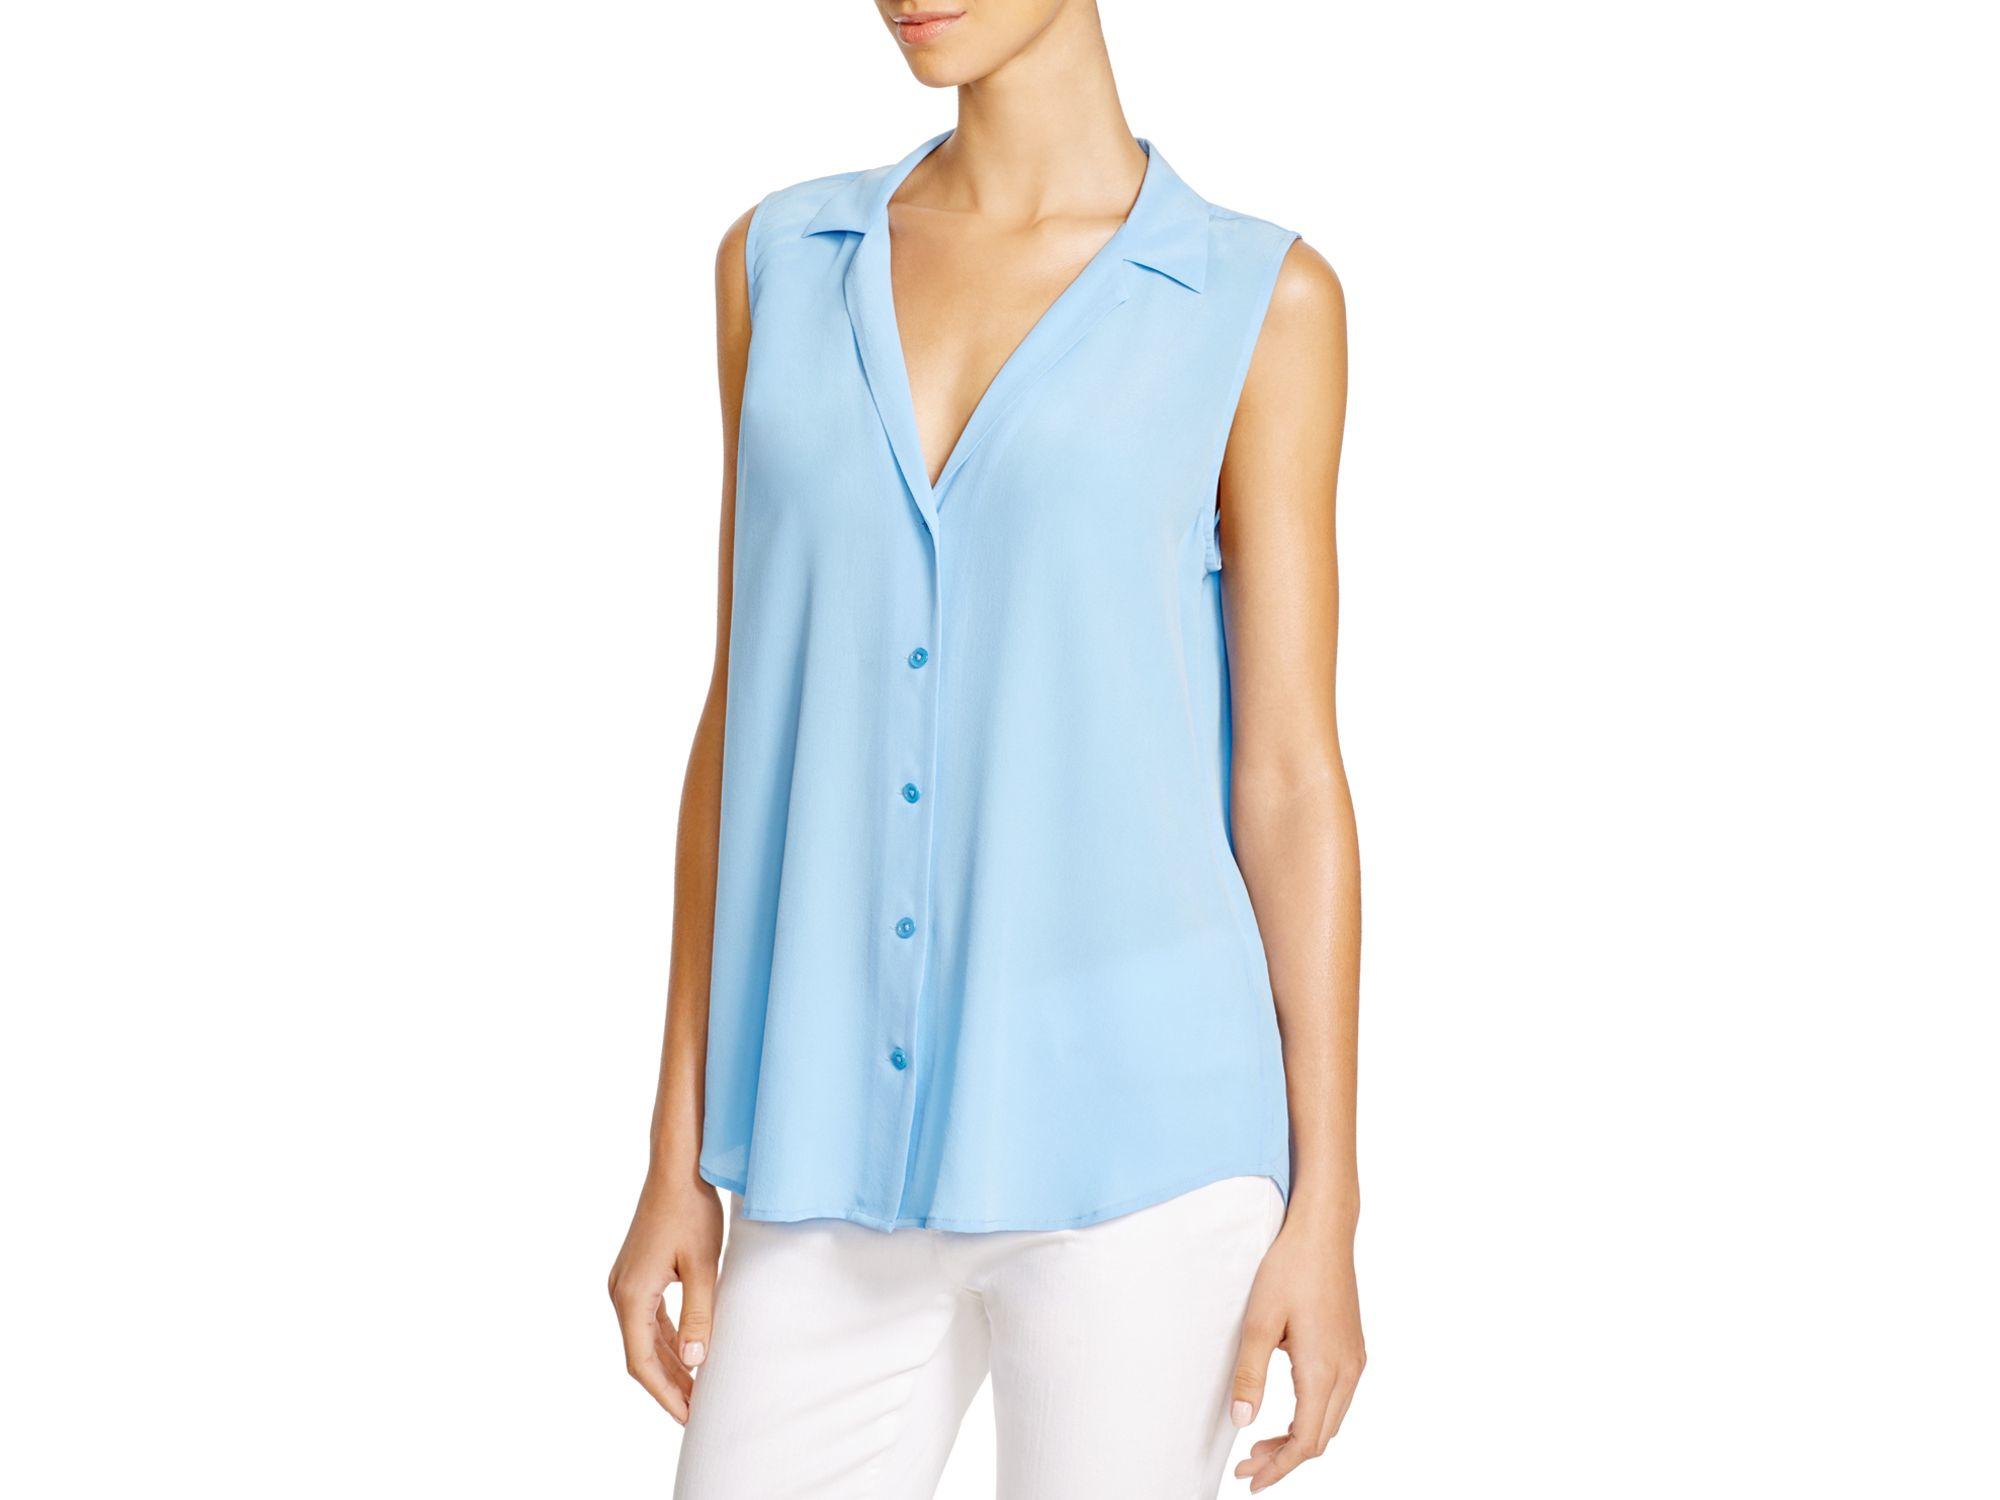 6fdcddce46b340 Lyst - Equipment Adalyn Button Down Shirt in Blue